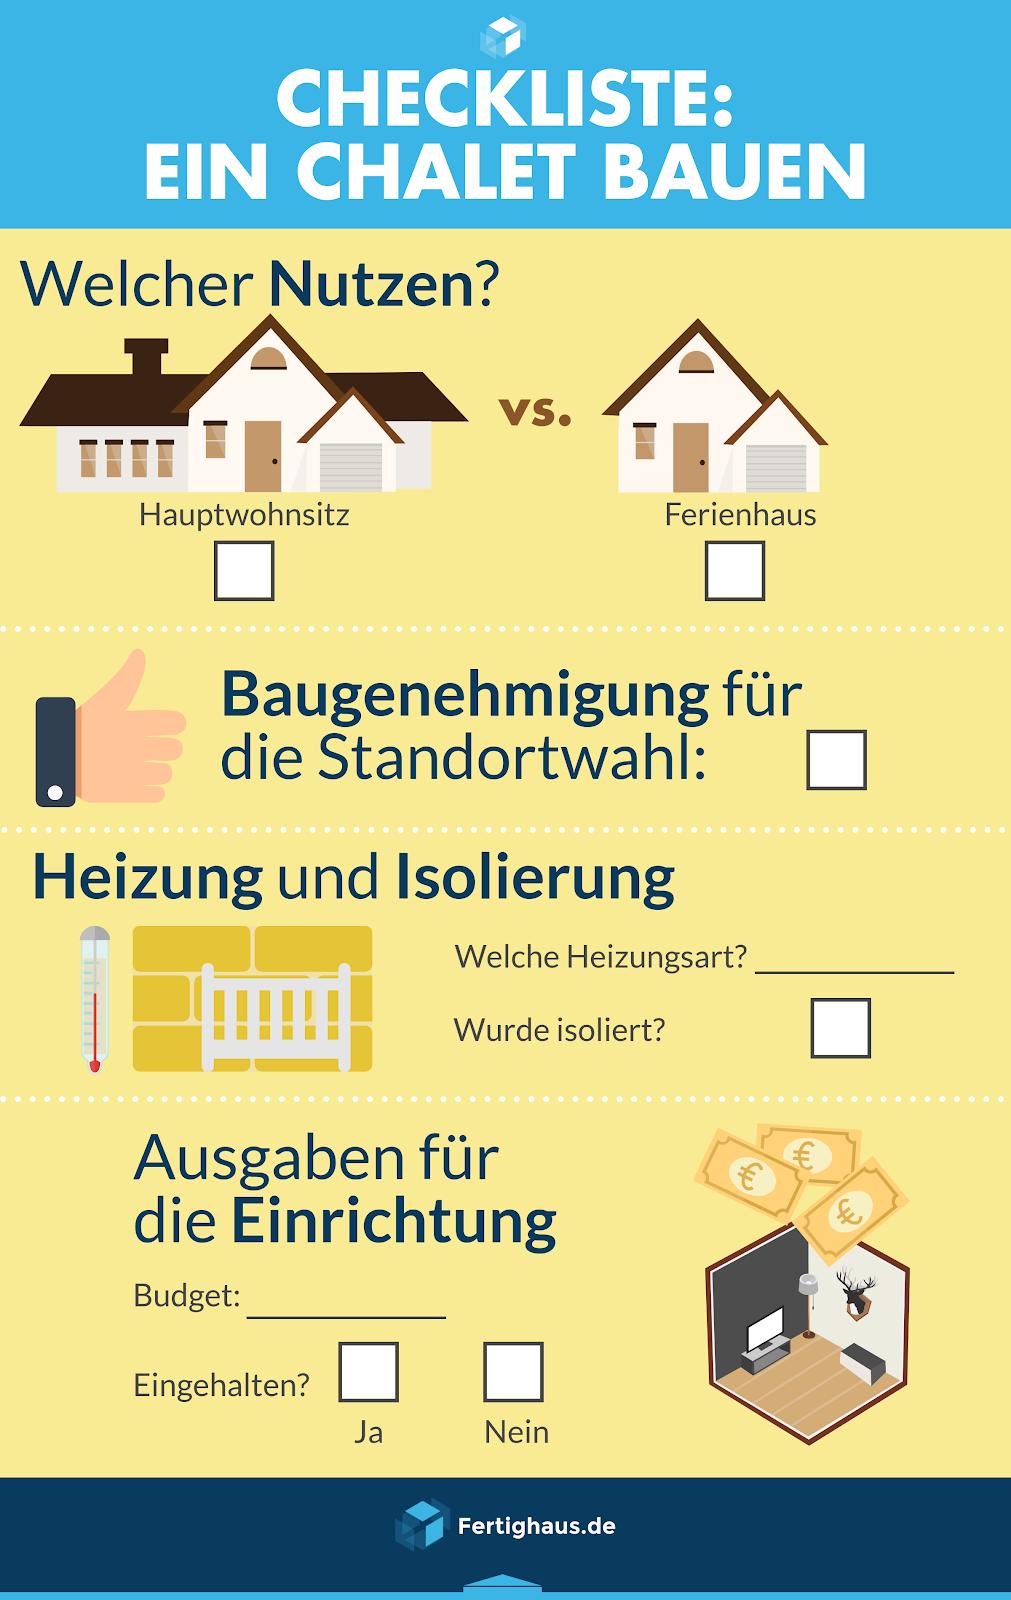 Checkliste-Chalet-bauen-Infografik.png